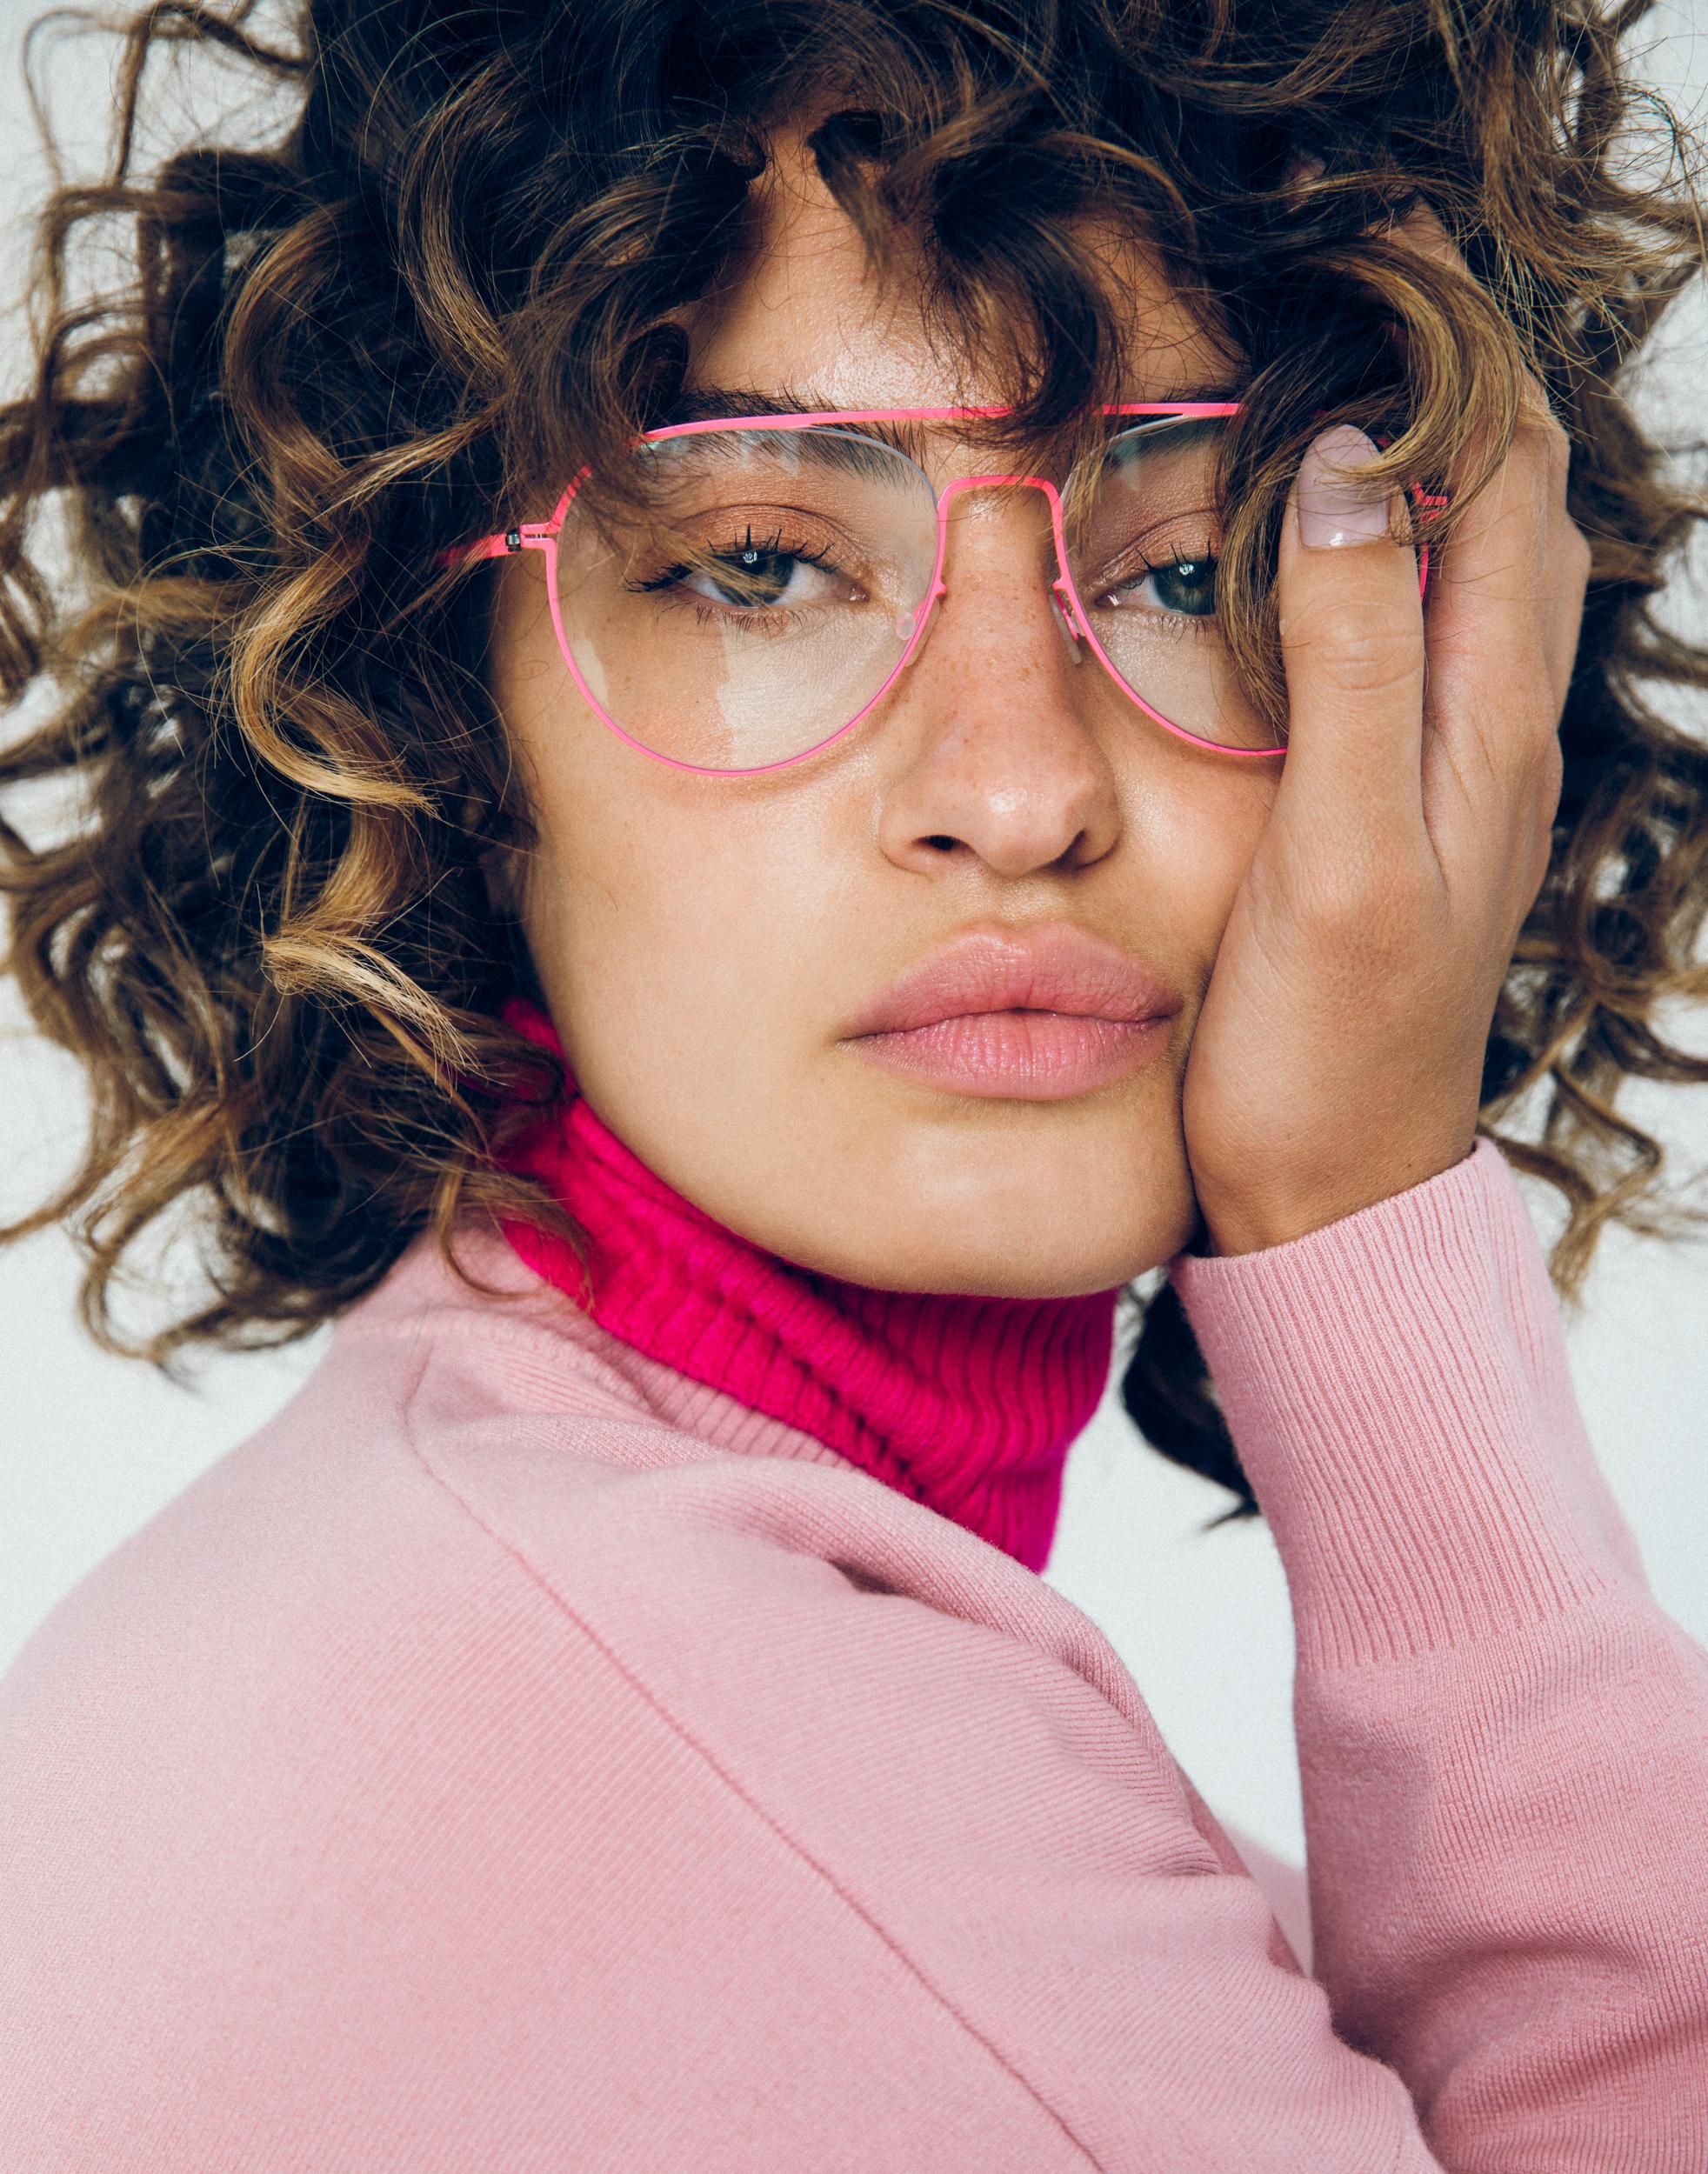 Suéter de BLUMARINE, jersey de TIBI y gafas de MYKITA.